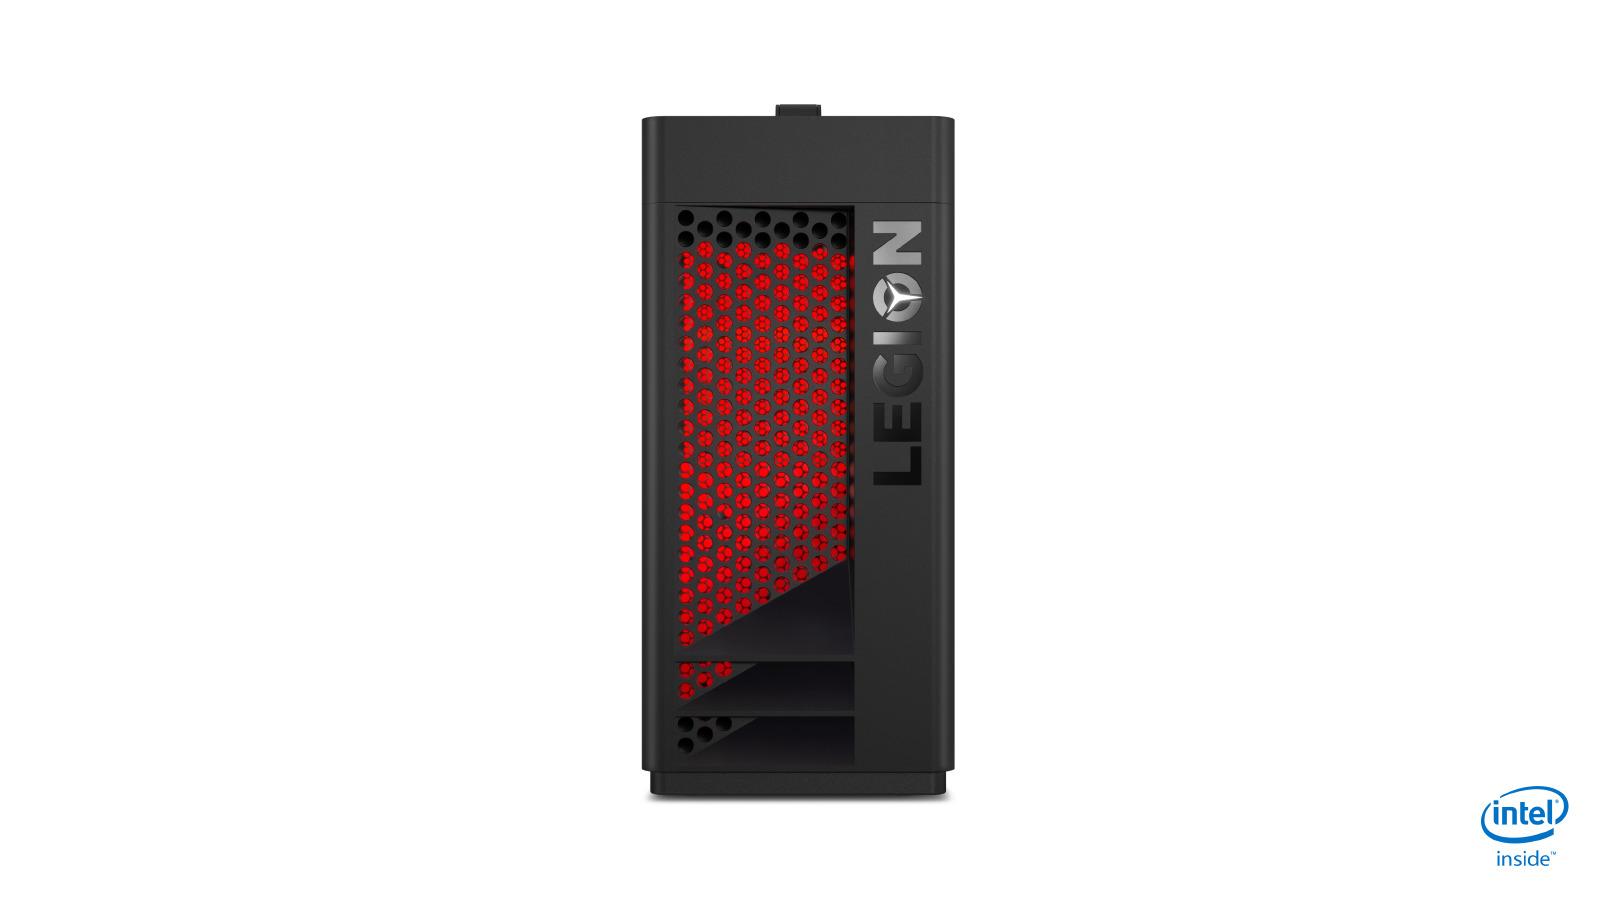 Lenovo IC T530  i5-8400/8G/1T/GTX1050/DVD/W10